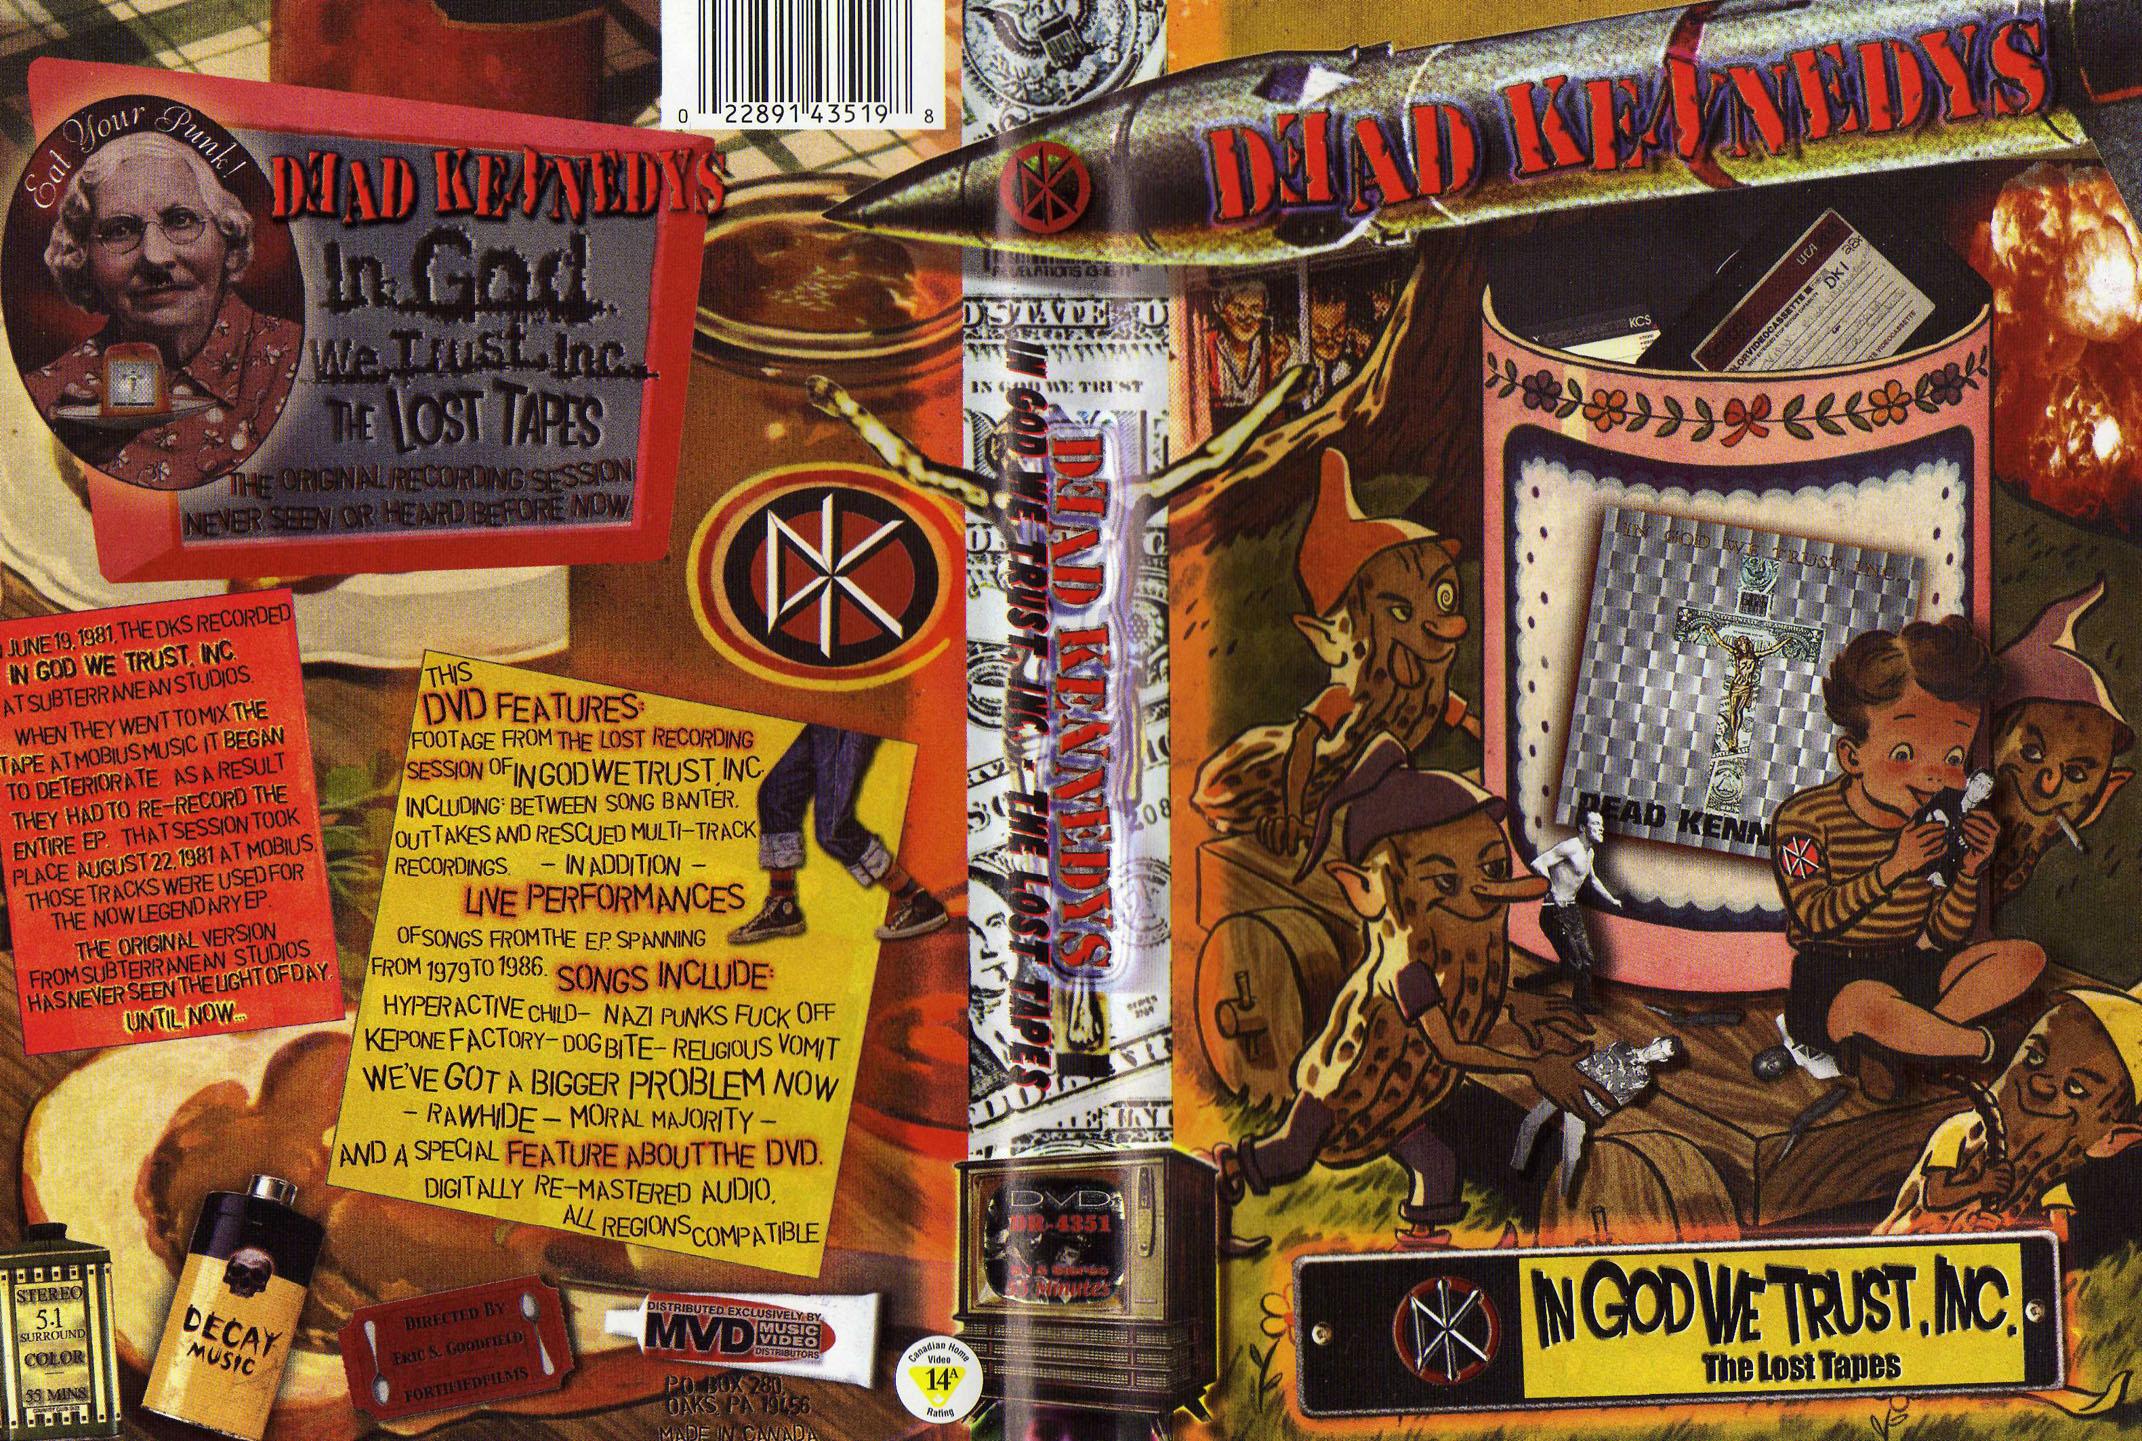 Dead Kennedys: «In God We Trust Inc.»